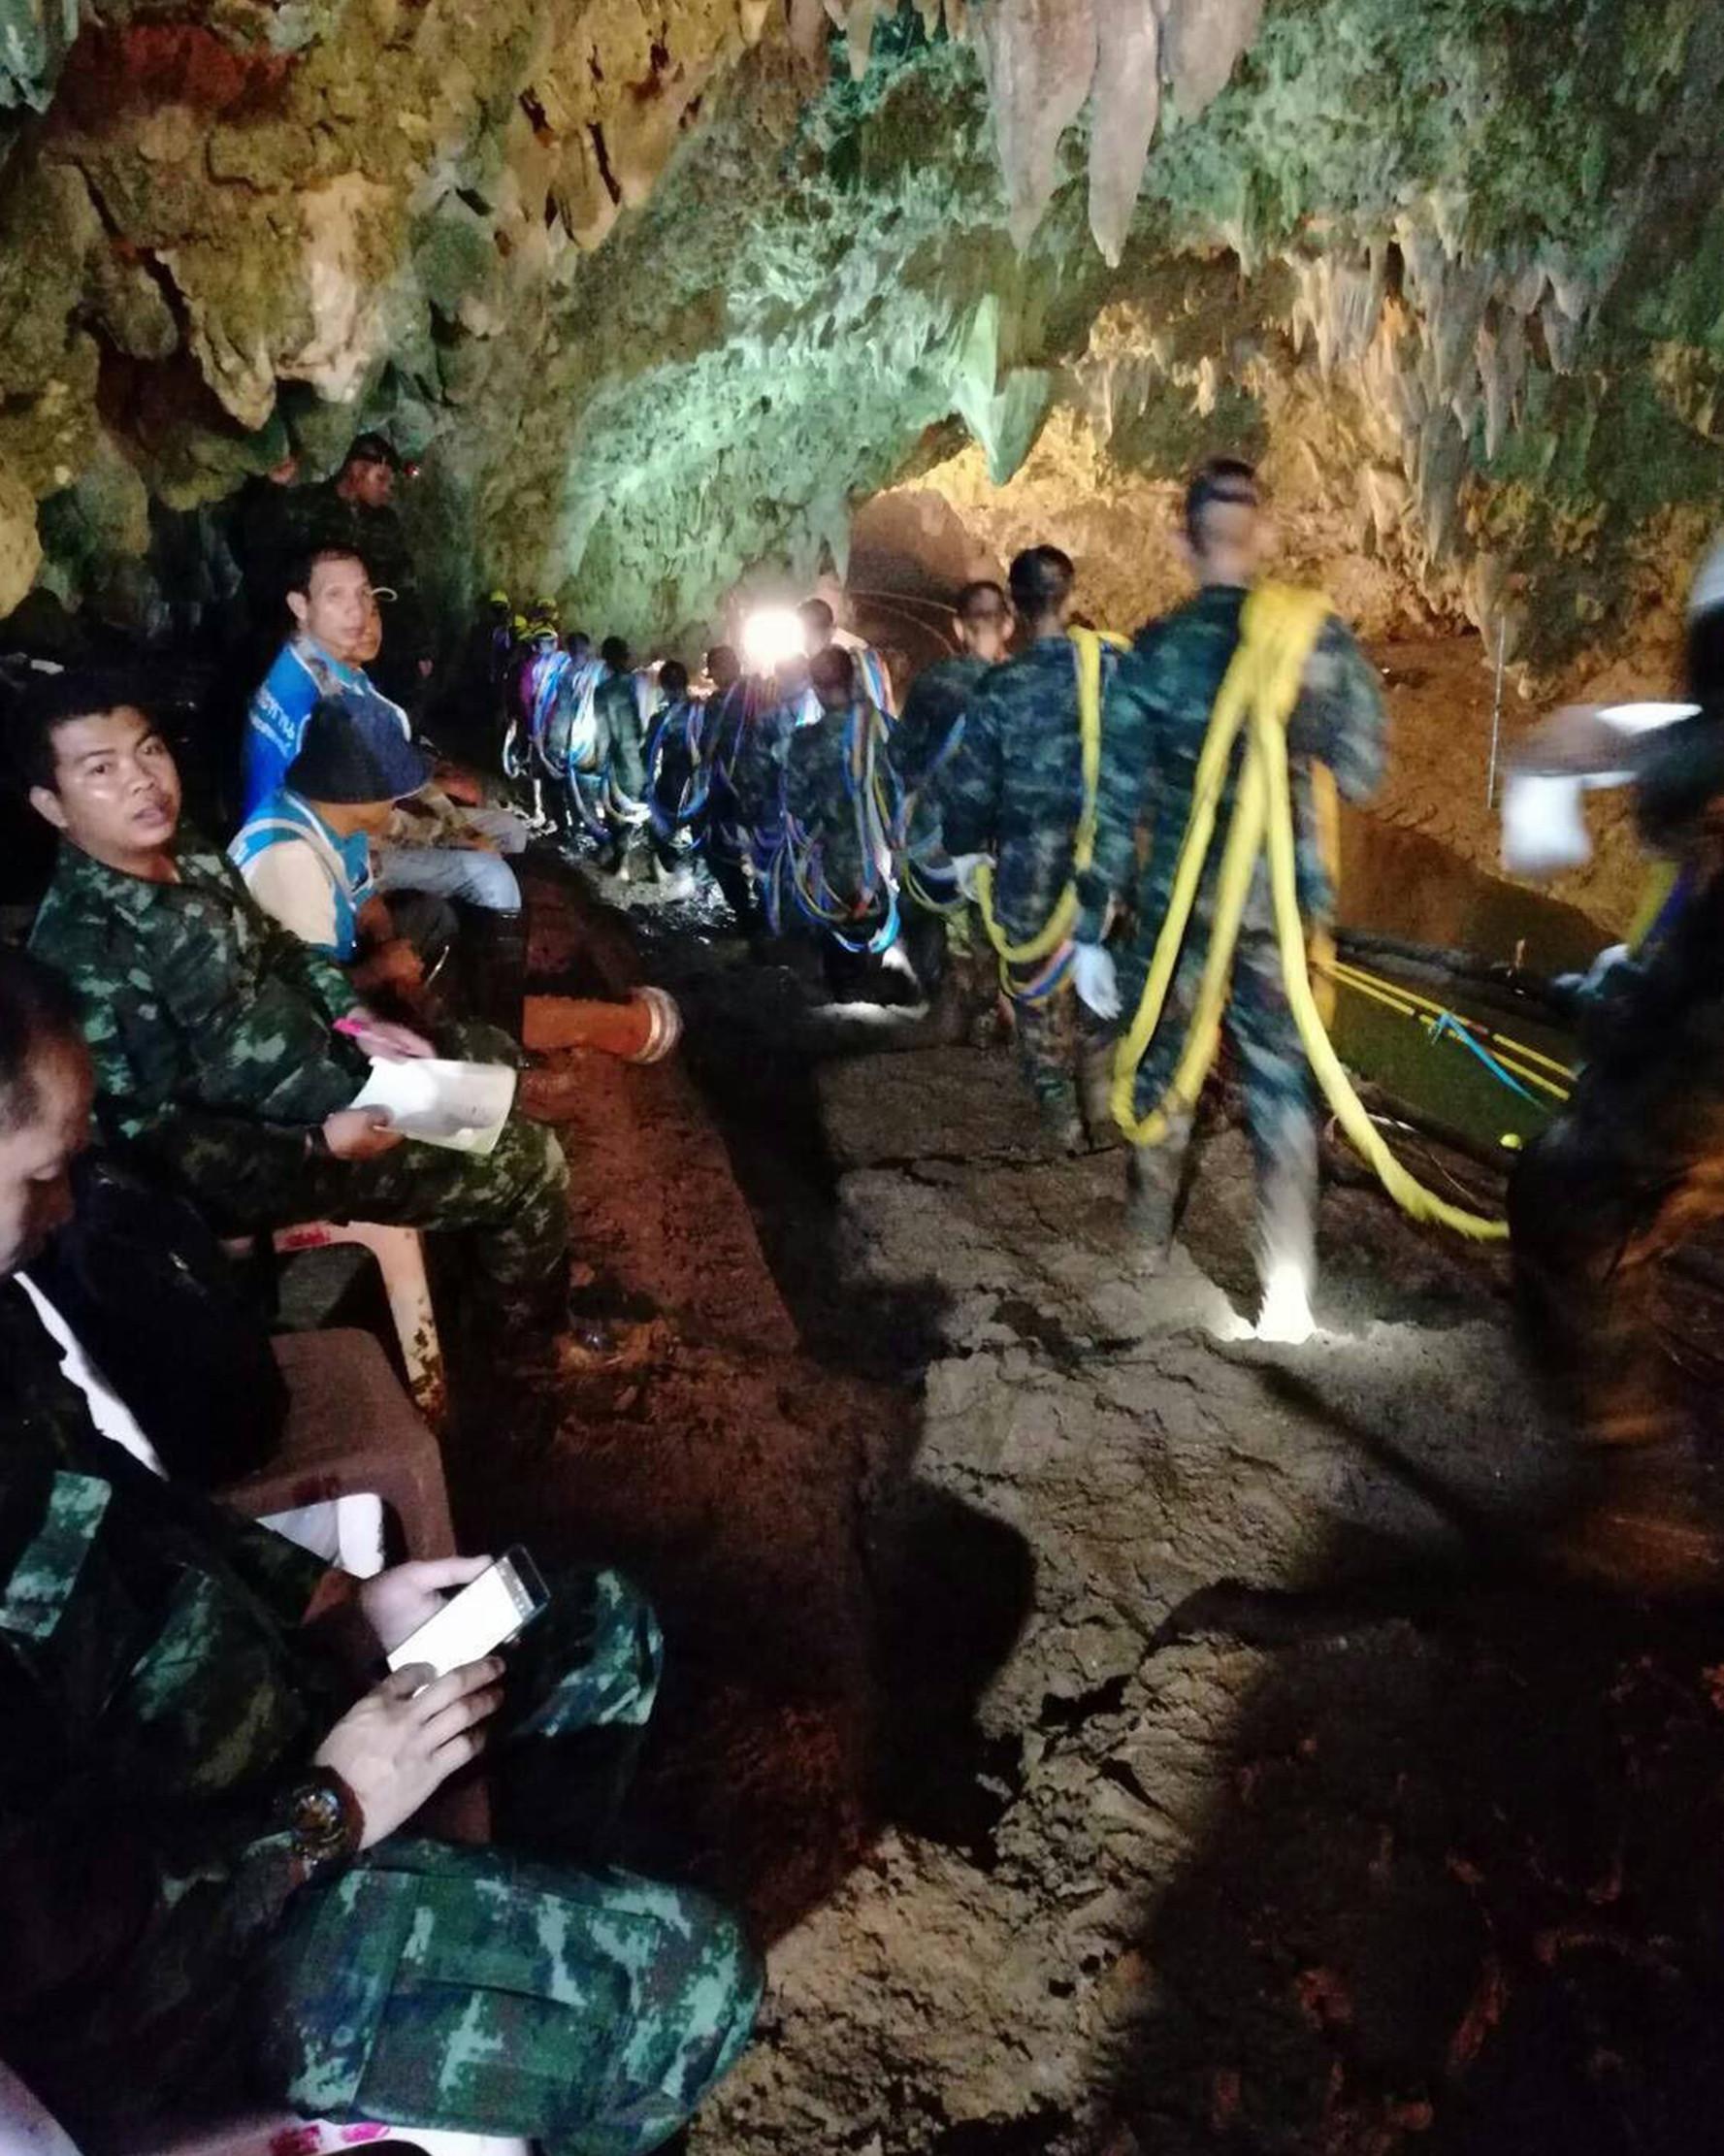 Tentara Thailand membawa tali untuk menyelamatkan tim sepak bola remaja Thailand dan pelatihnya yang terjebak di sebuah gua di Chiang Rai, Thailand, Senin (2/7). Unit penyelam AL Thailand menyebut korban diberi makan jel energi. (ROYAL THAI NAVY/AFP)